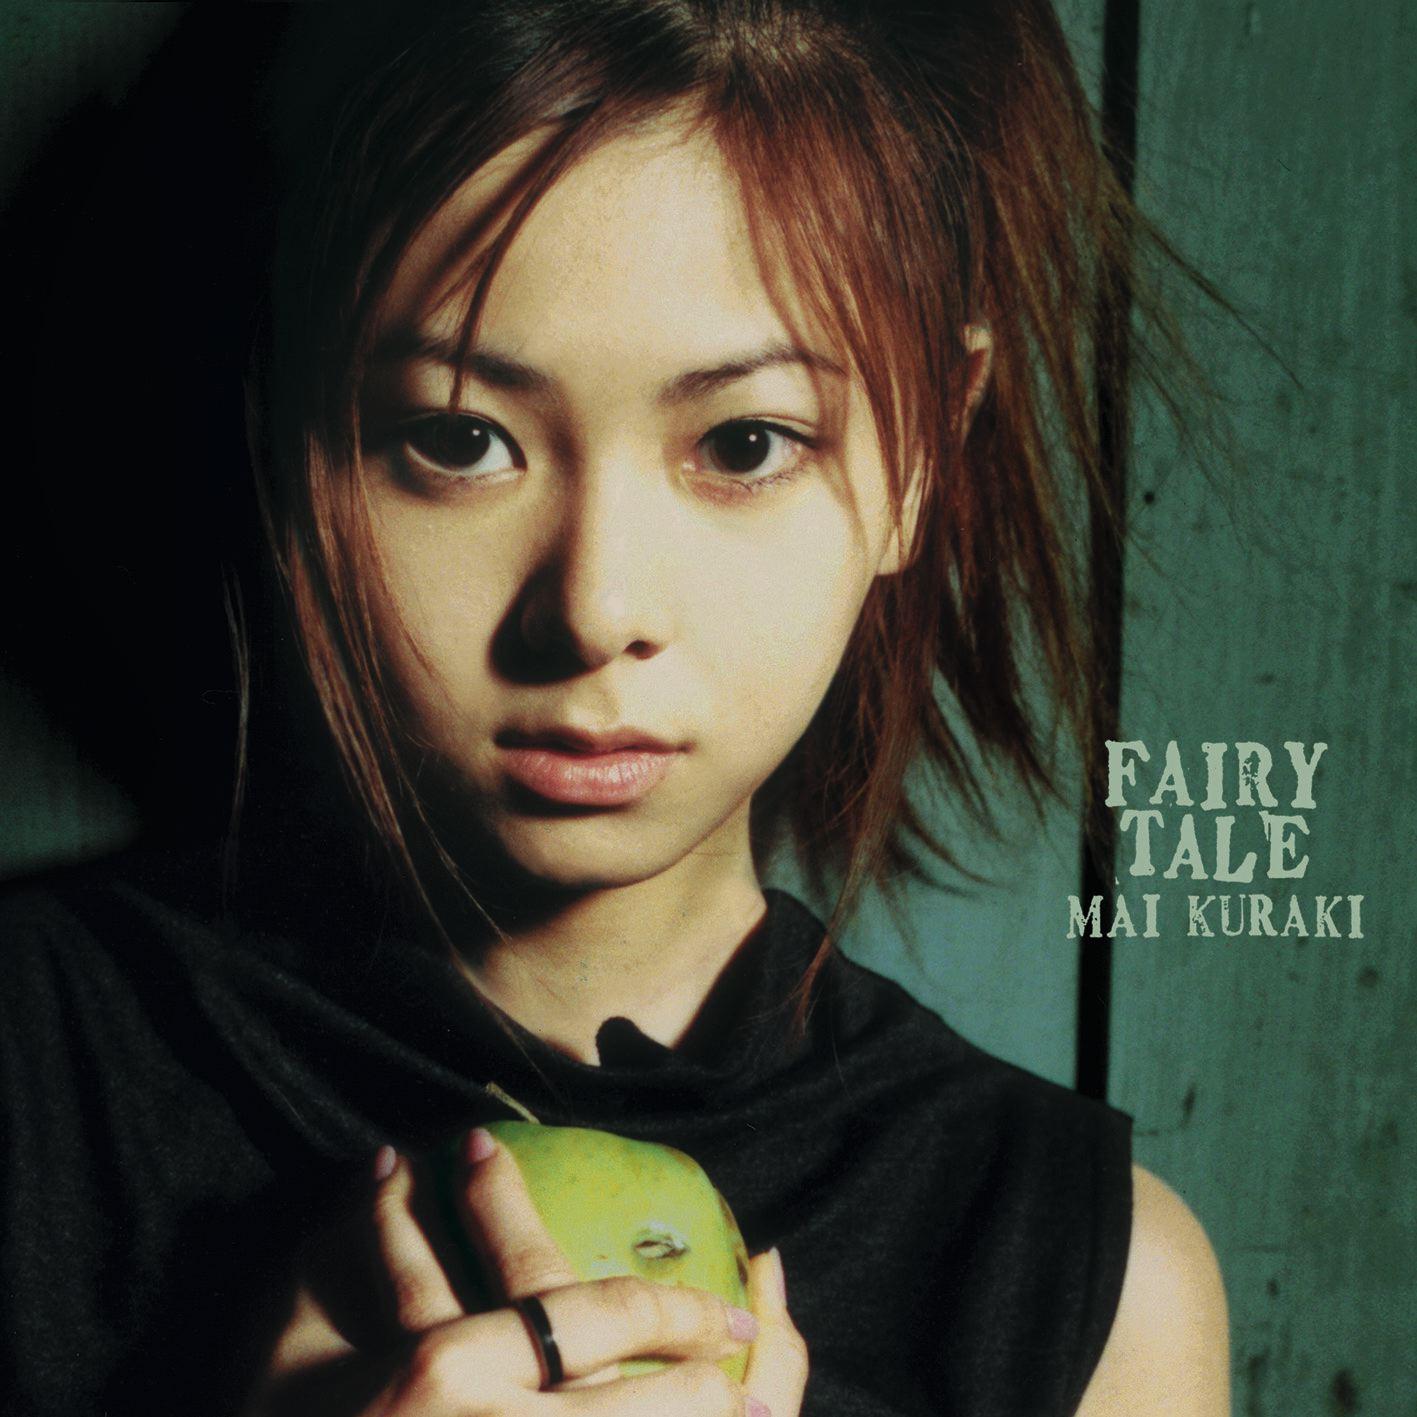 20161211.02.26 Mai Kuraki - Fairy tale cover.jpg